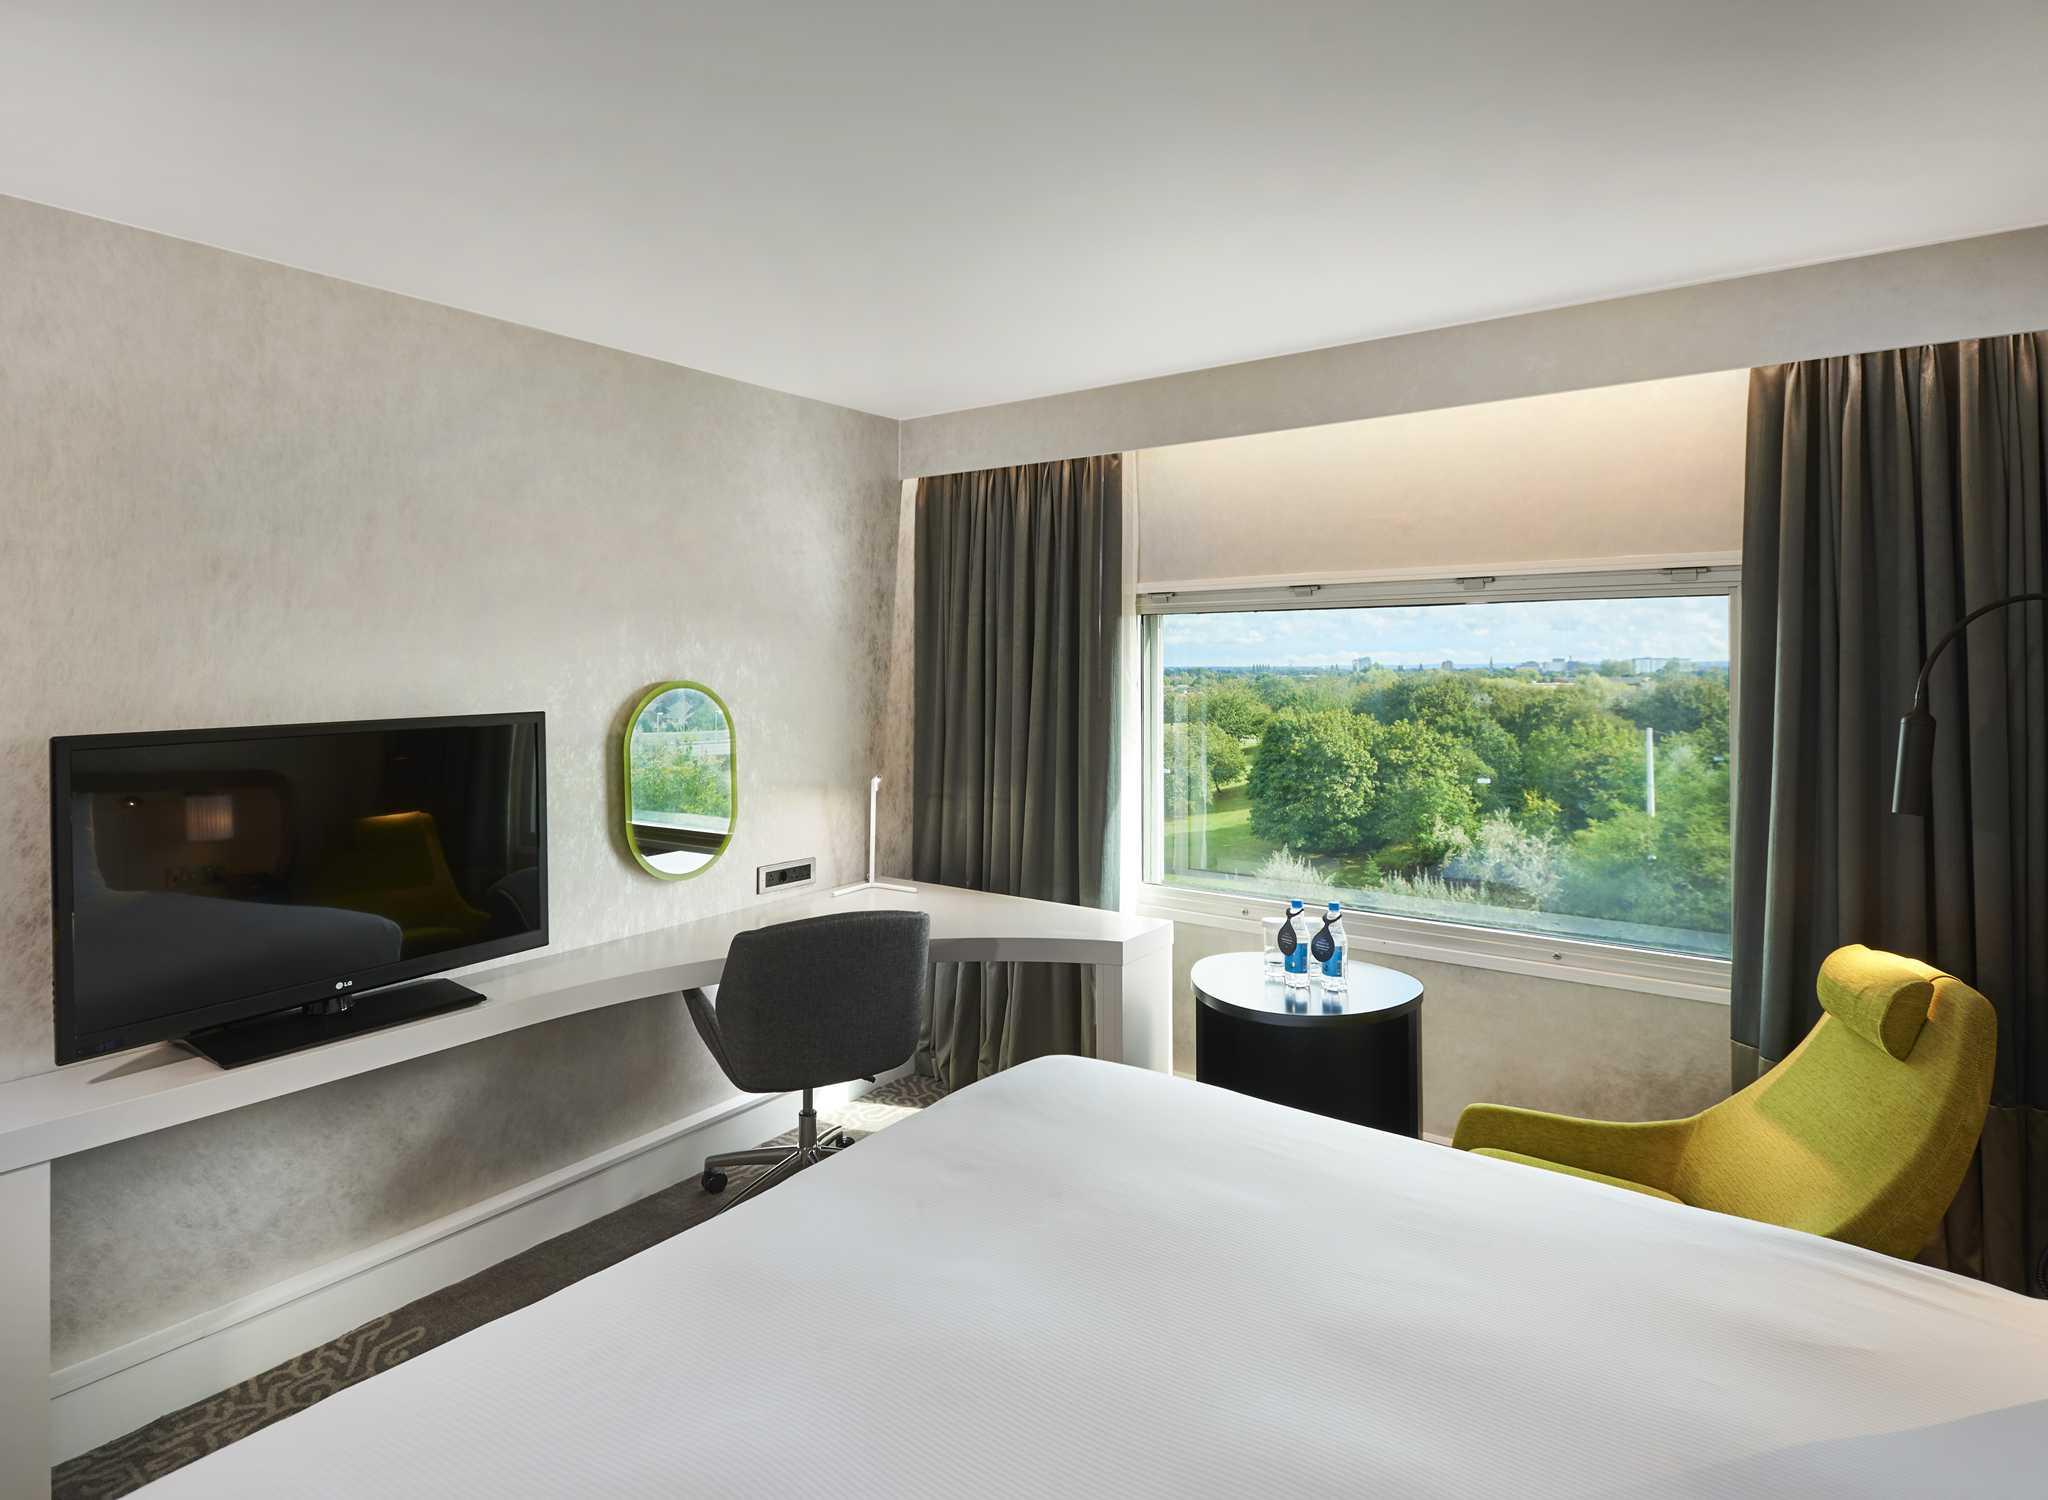 hilton london heathrow airport – hotels in london, vereinigtes, Hause deko